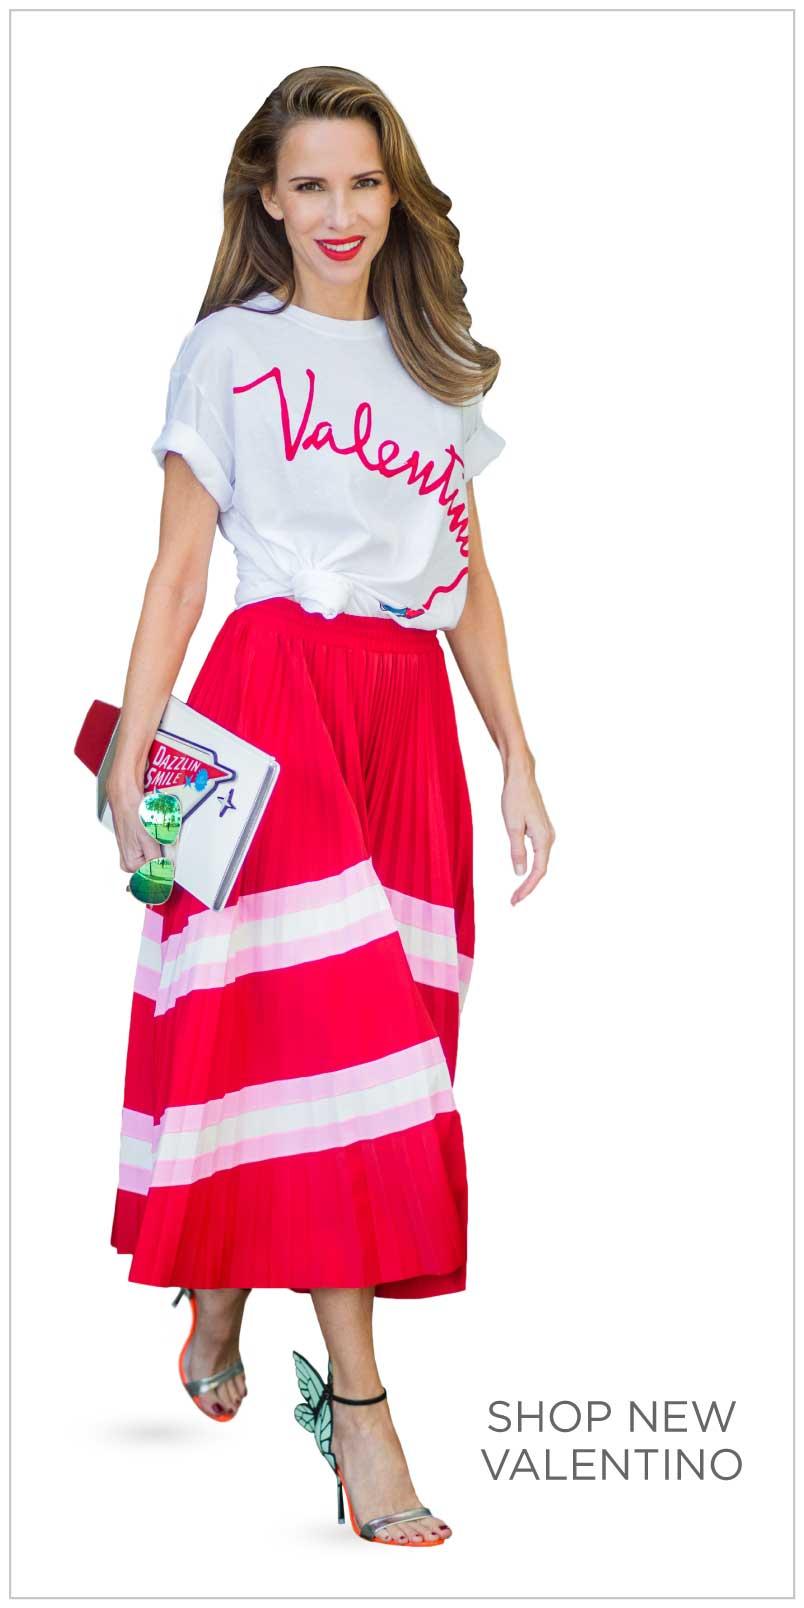 New Valentino Arrivals